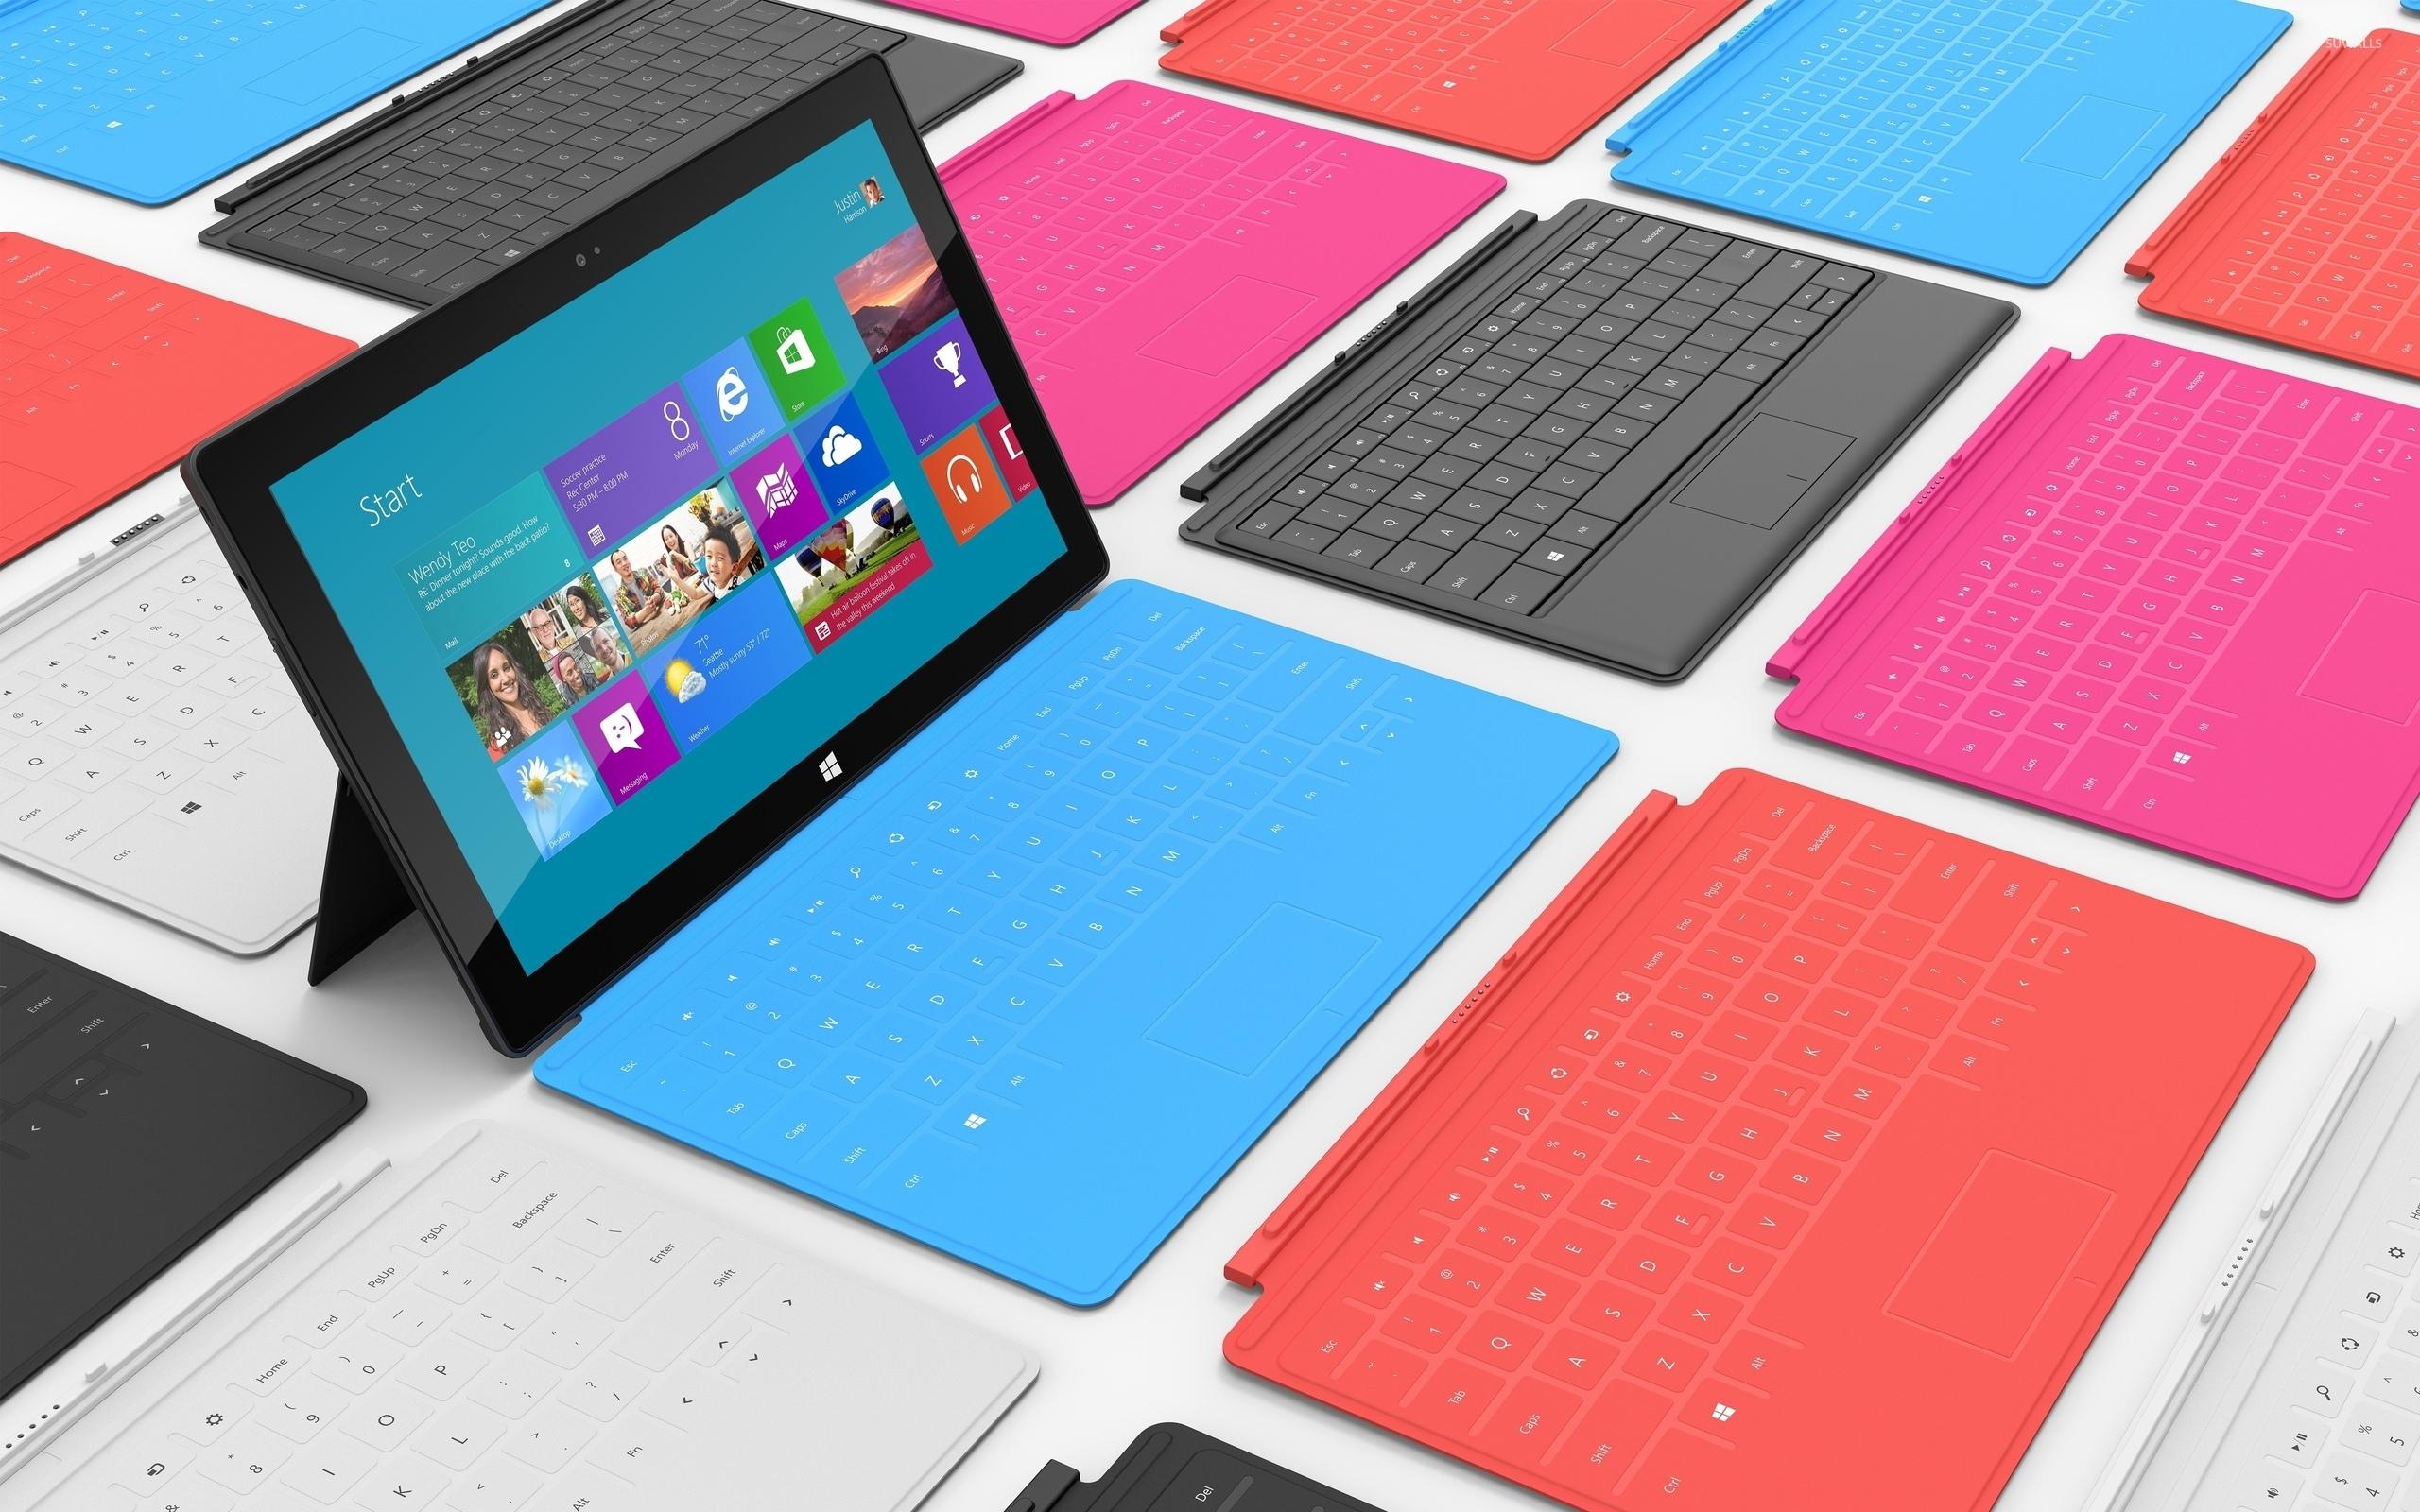 Surface Pro 4 Wallpaper